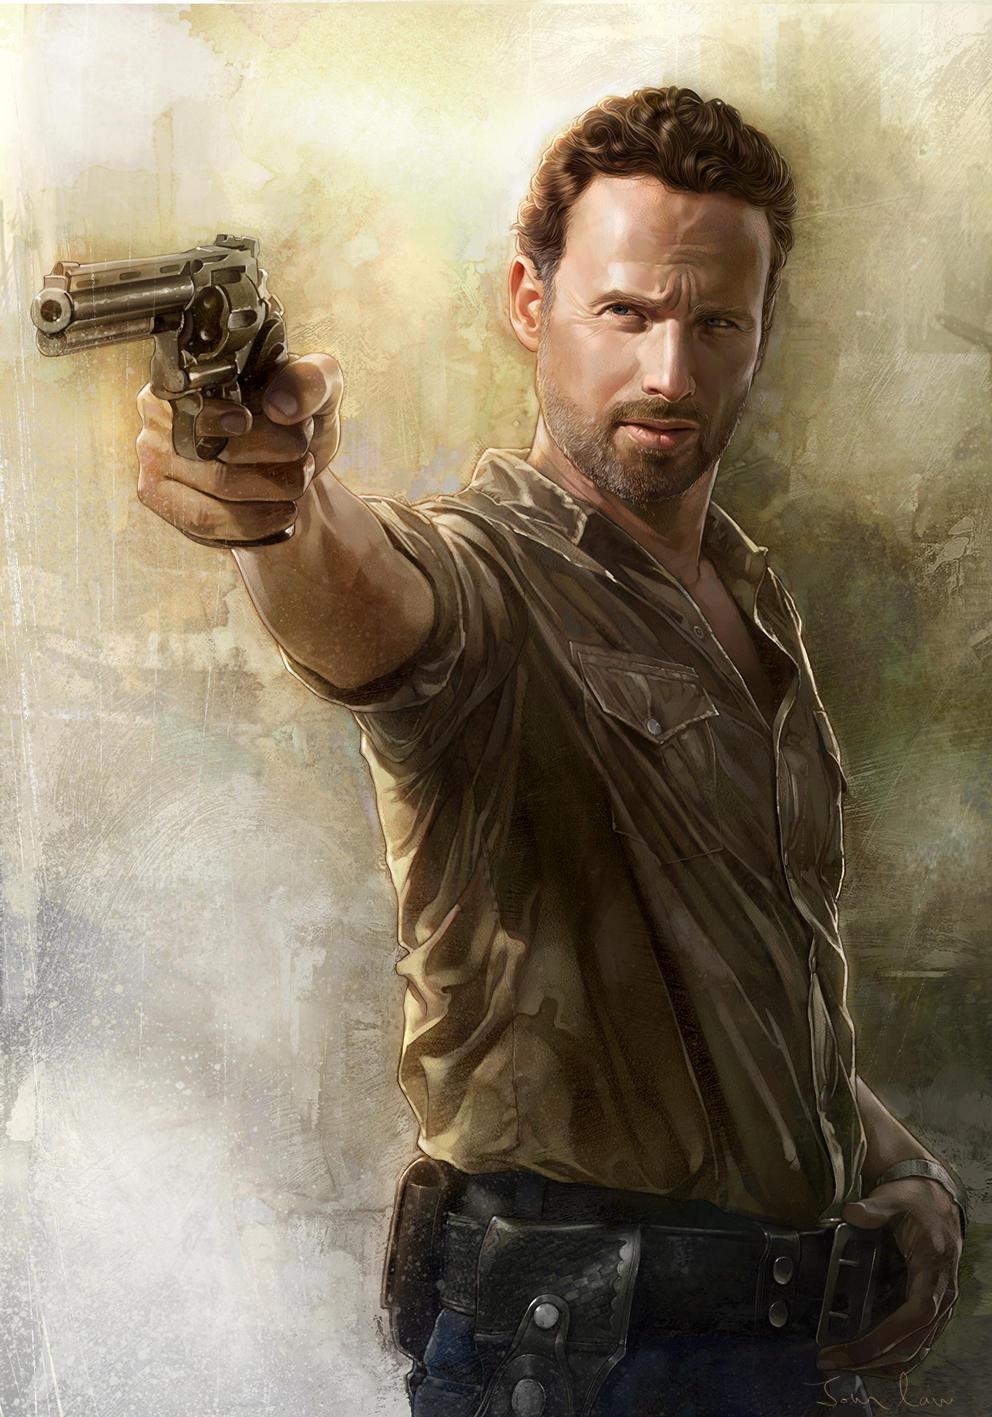 The Walking Dead - Rick Grimes by JohnLaw82